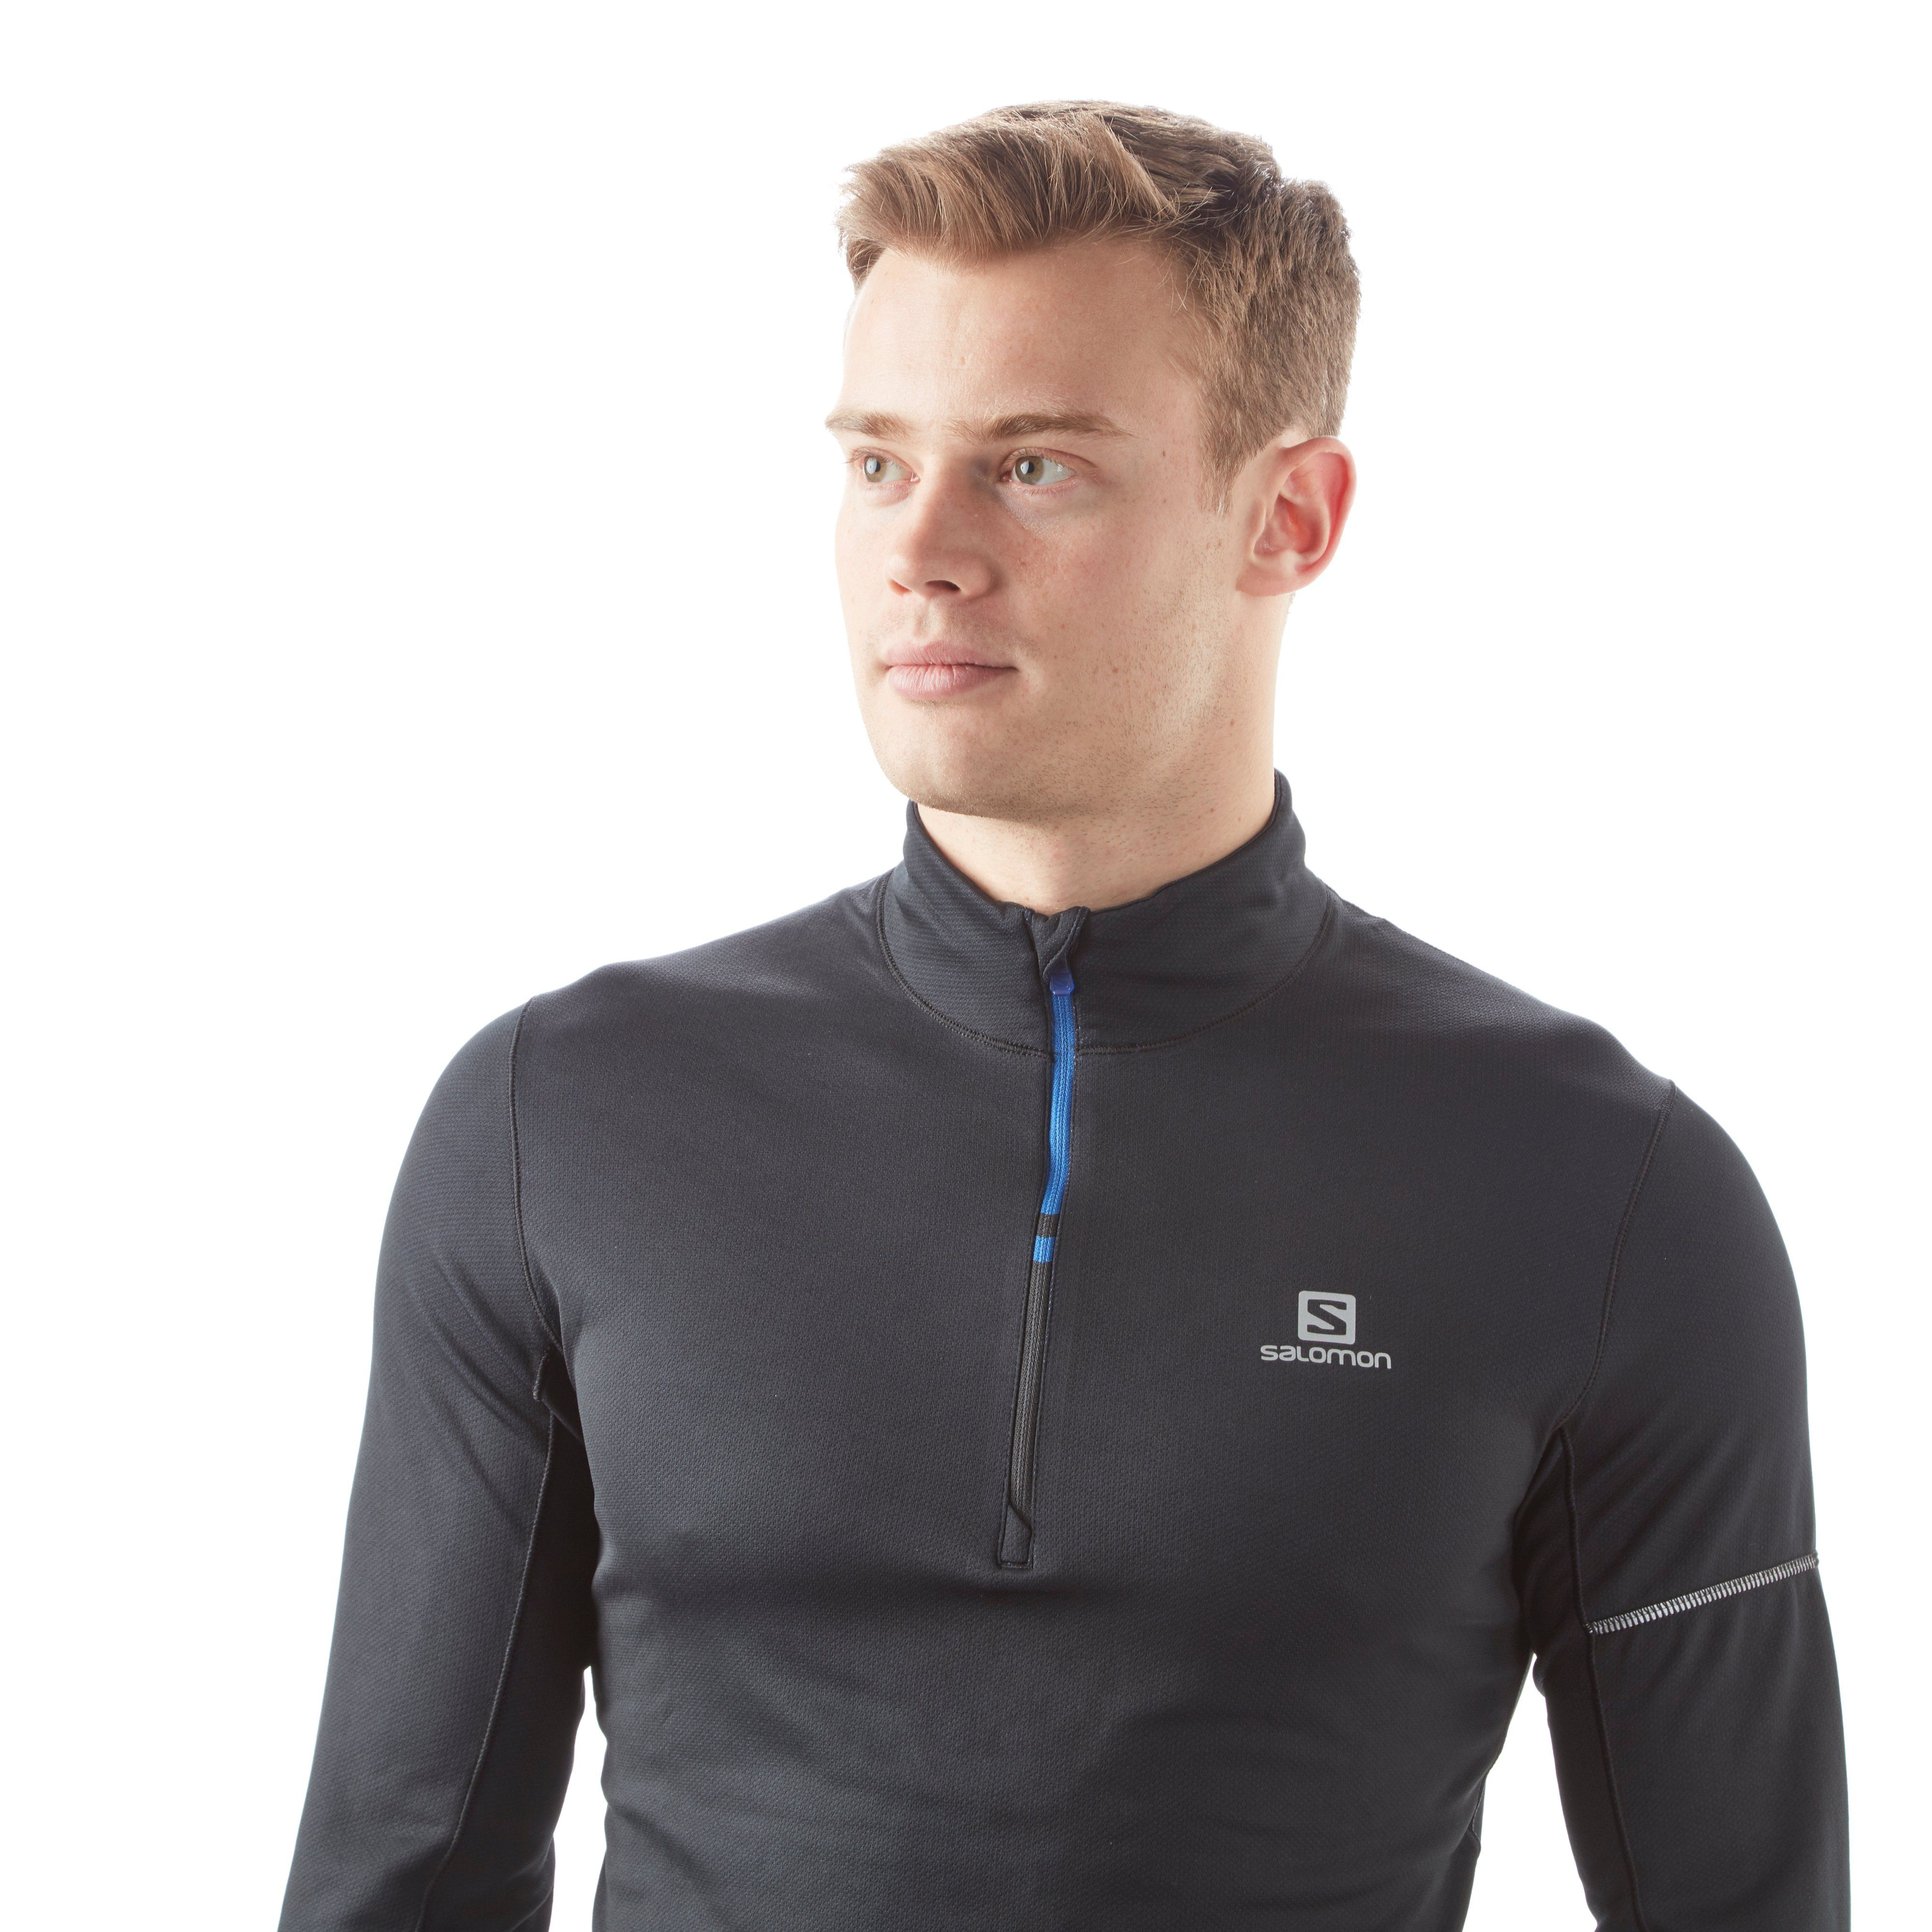 Salomon Agile HZ Mid-Layer Men's trail Running Top